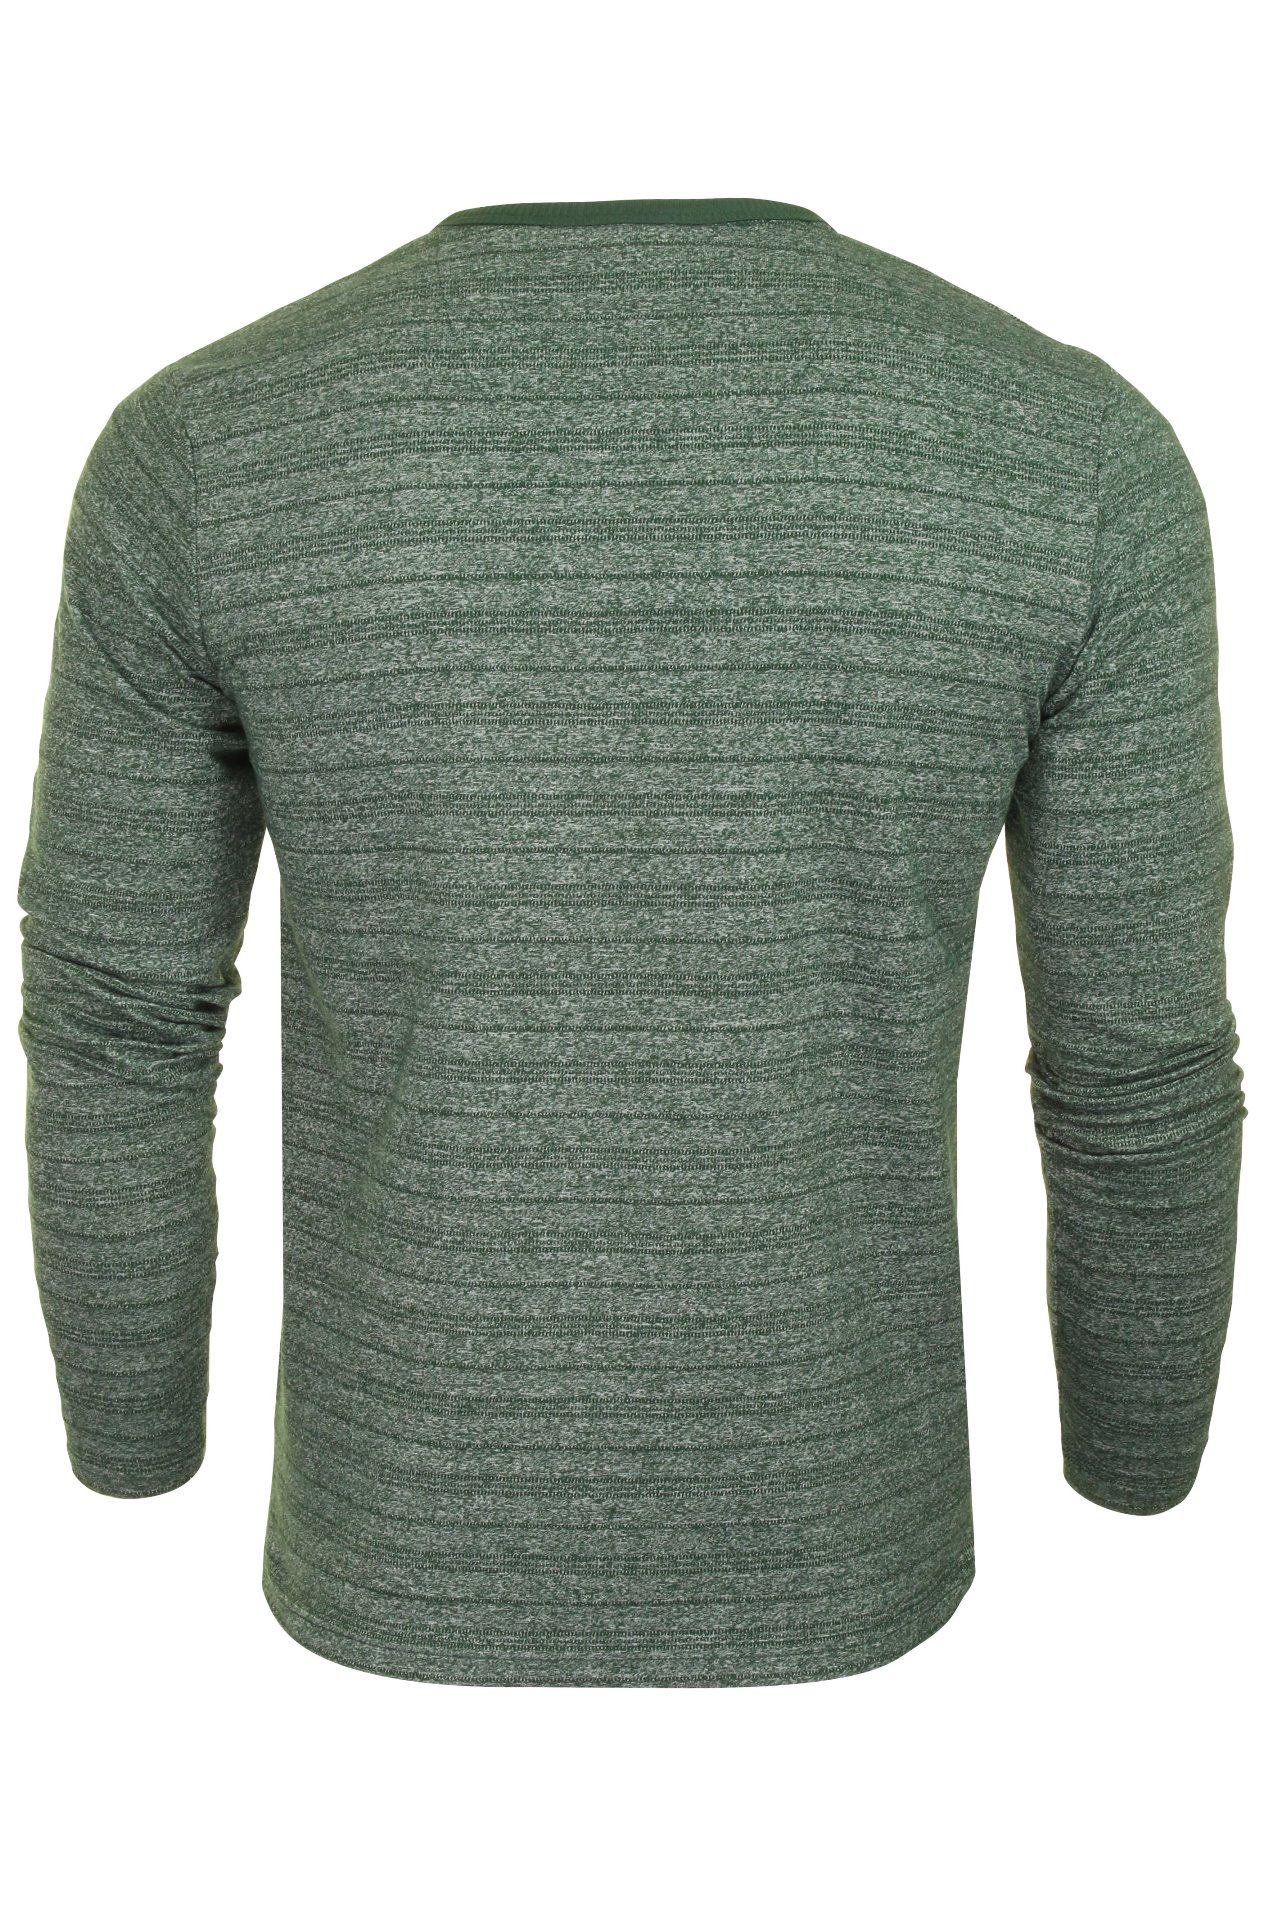 Long Sleeved Tokyo Laundry /'Hoaden/' Gindle Grandad T-Shirt